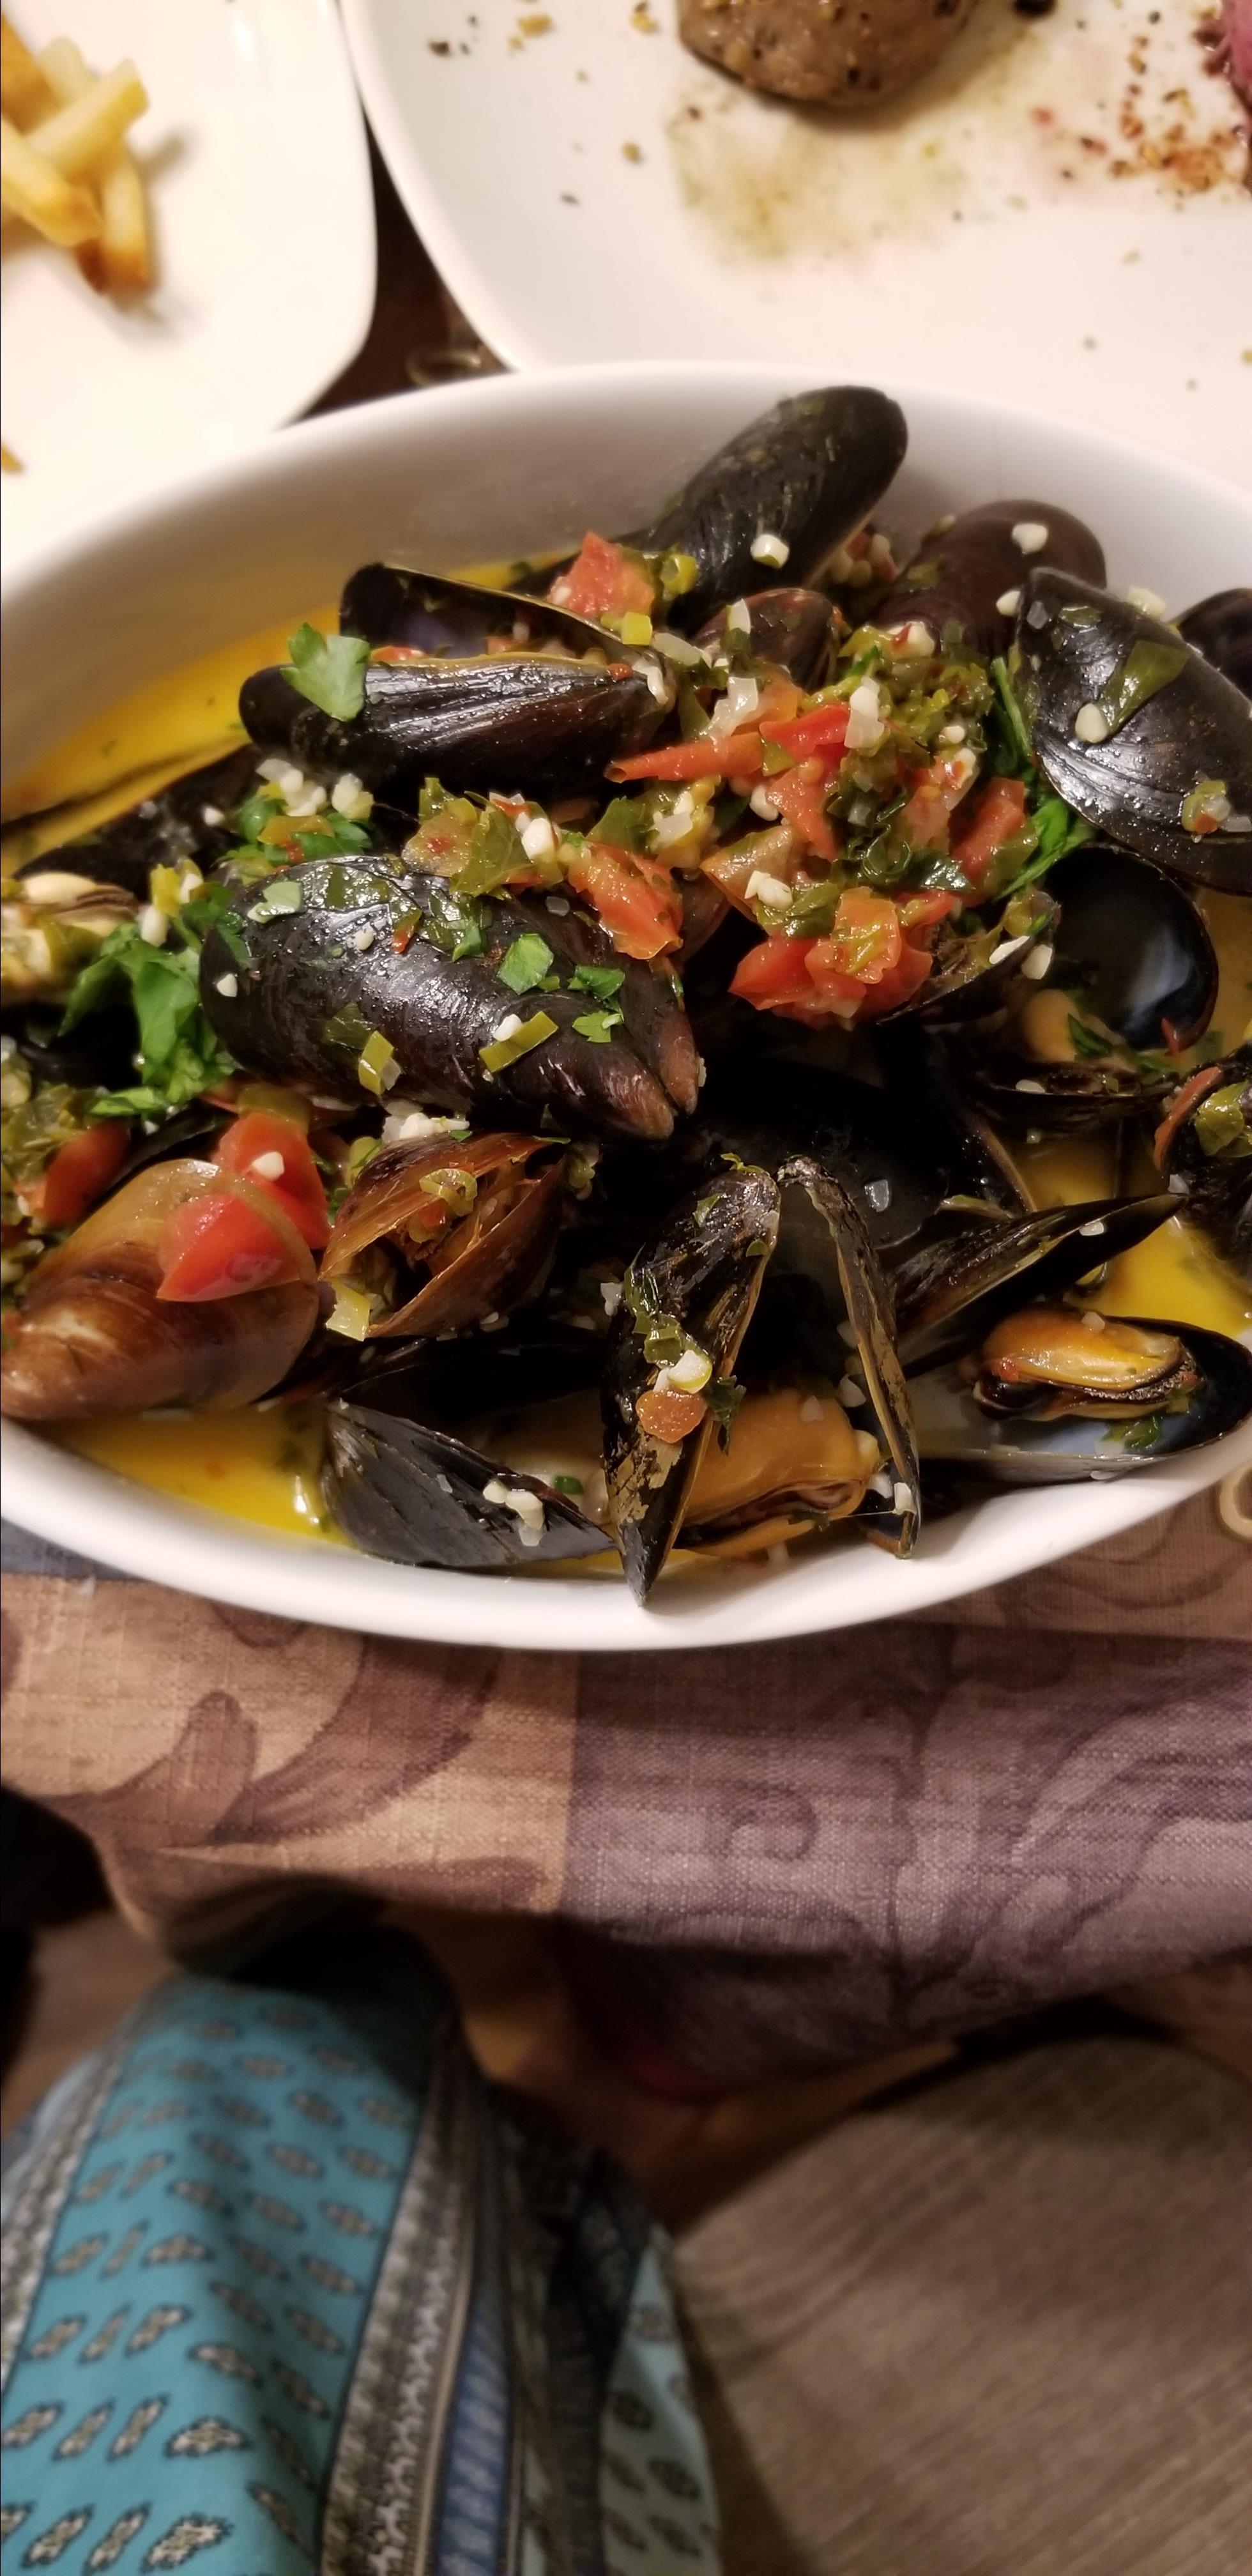 Patti's Mussels a la Mariniere